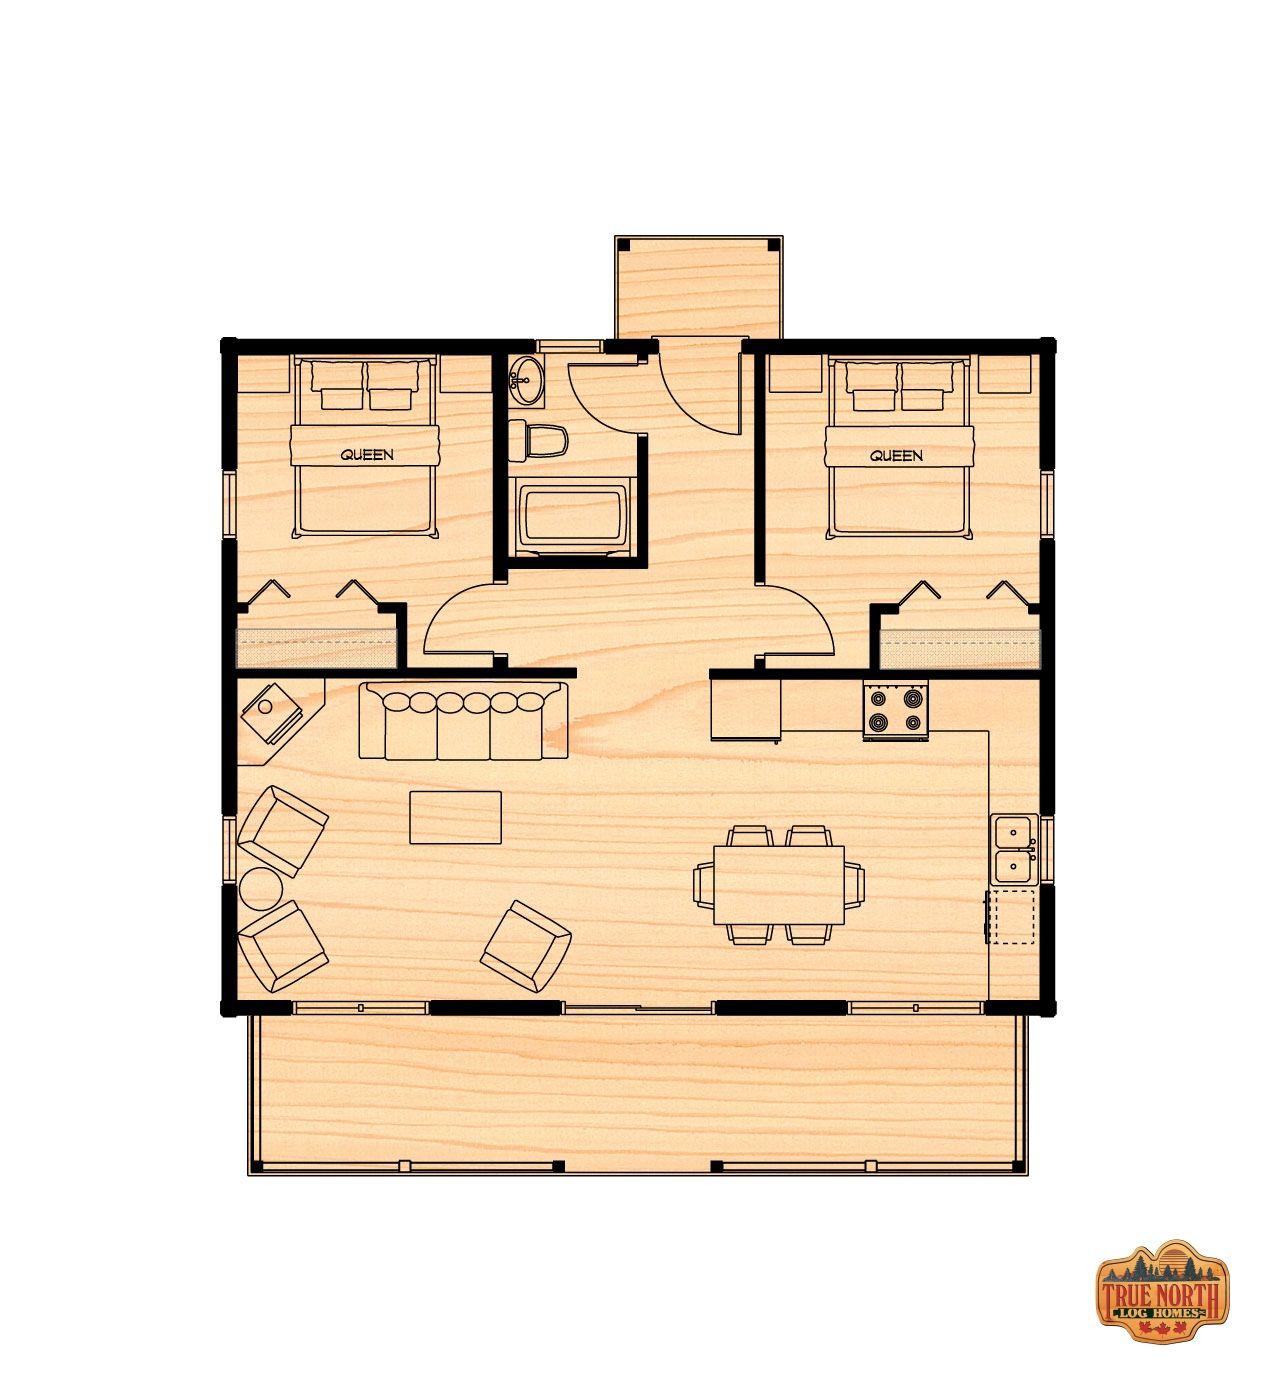 Ashburn Small True North Log Homes Small Log Homes House Floor Plans Cabin House Plans